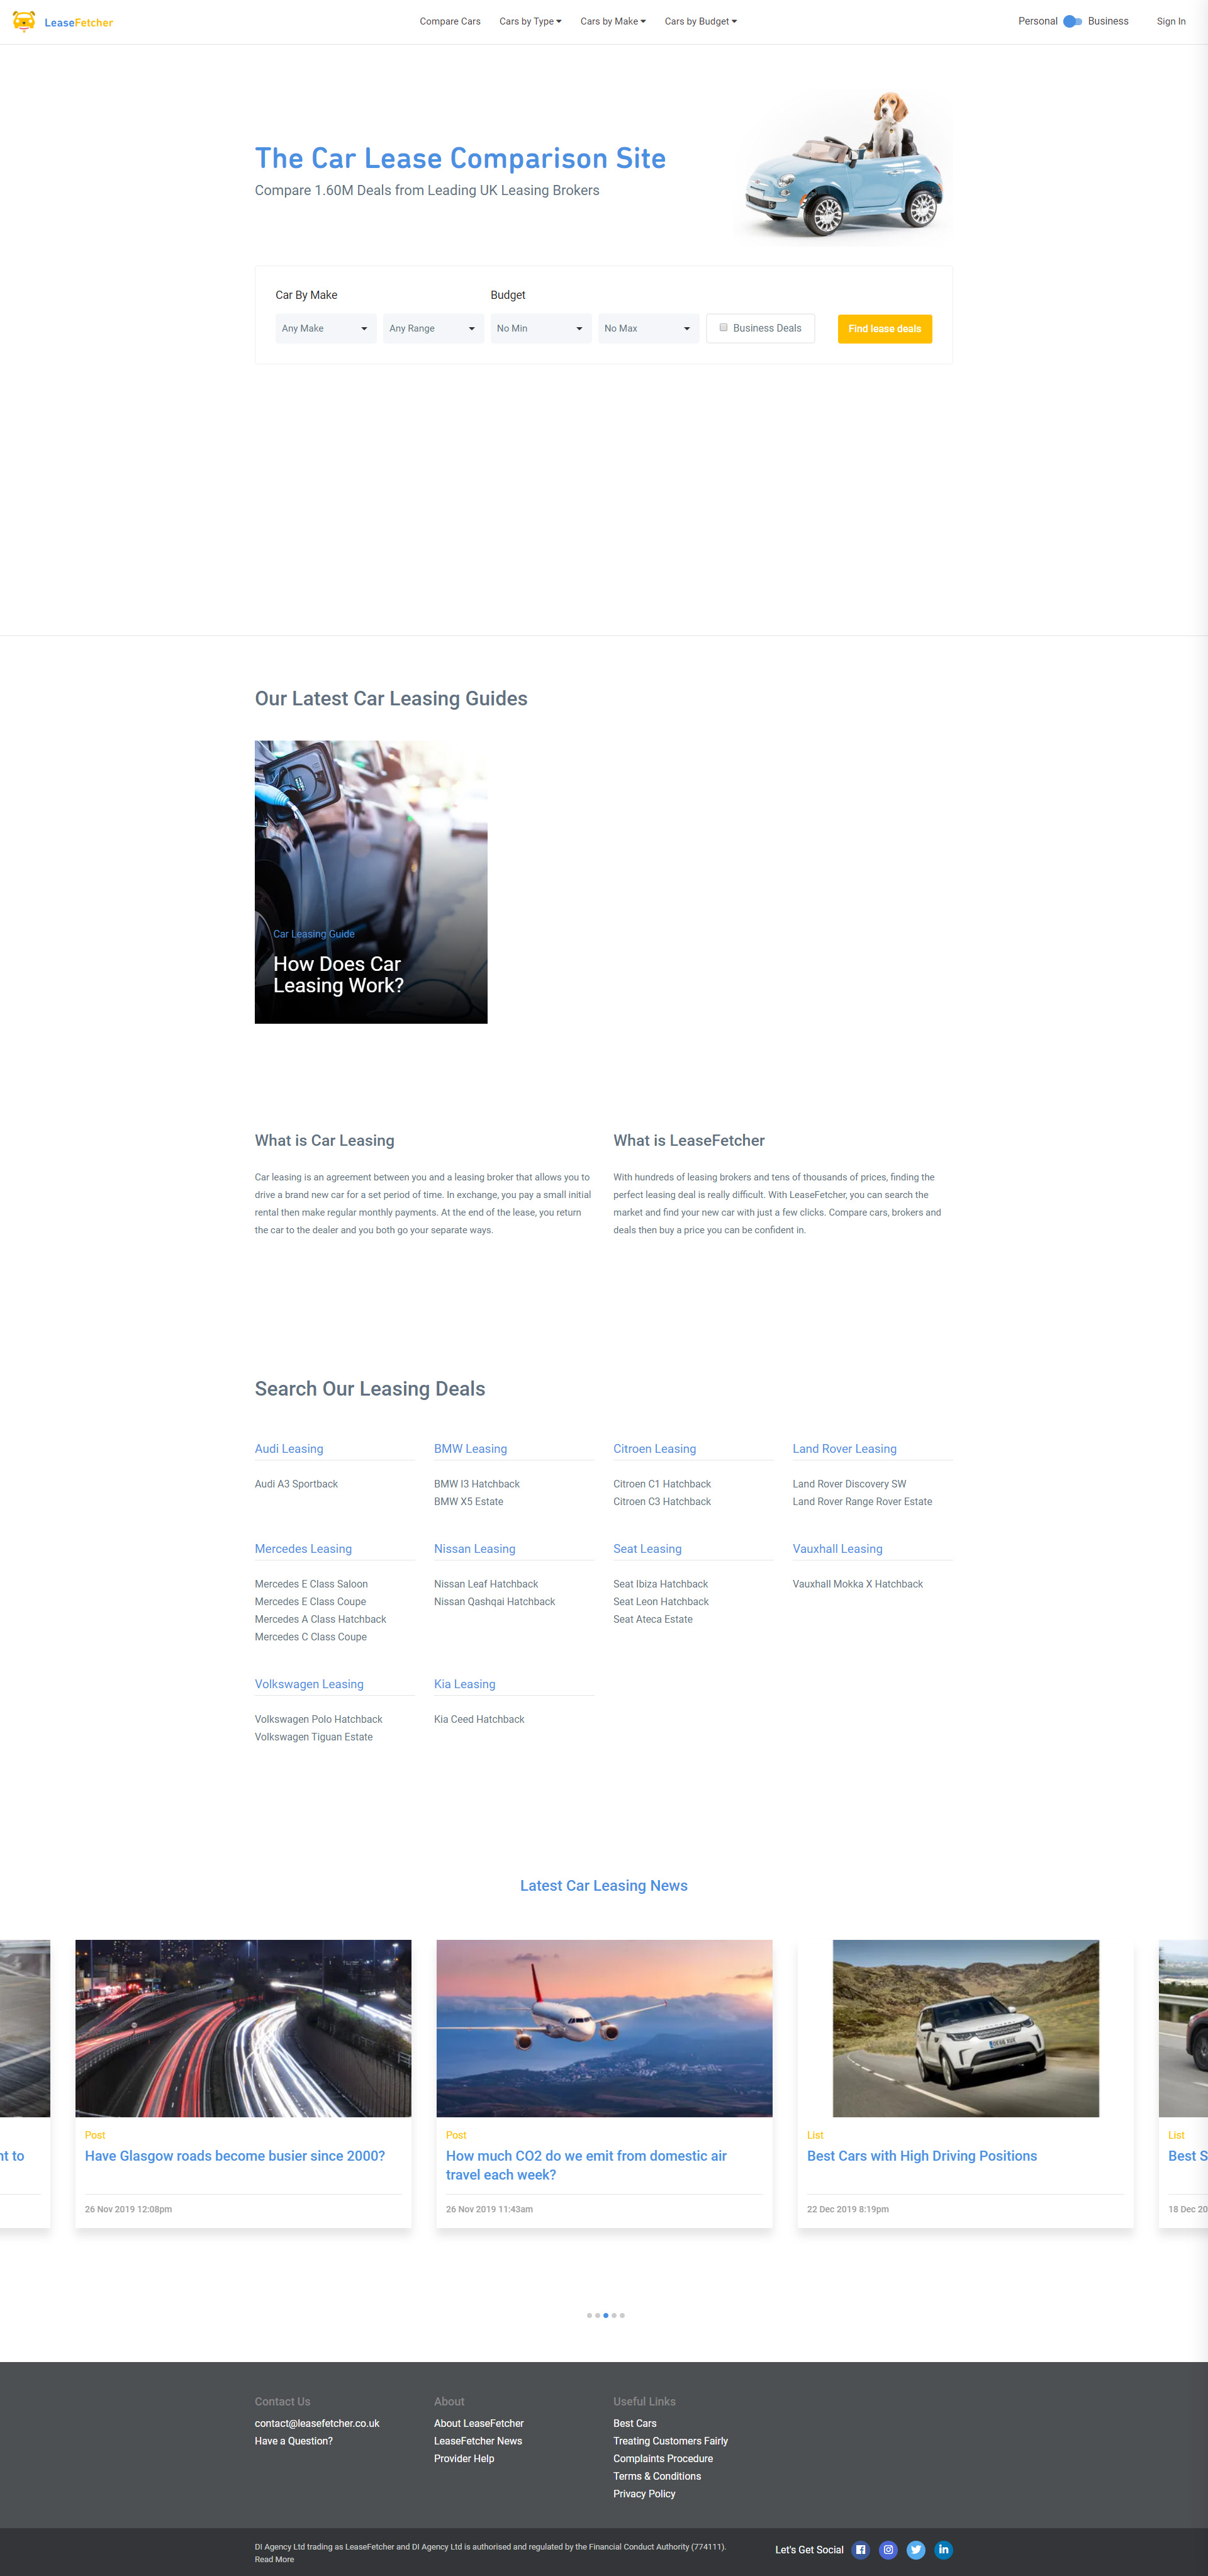 Previous Automobile Comparison Website Design Example